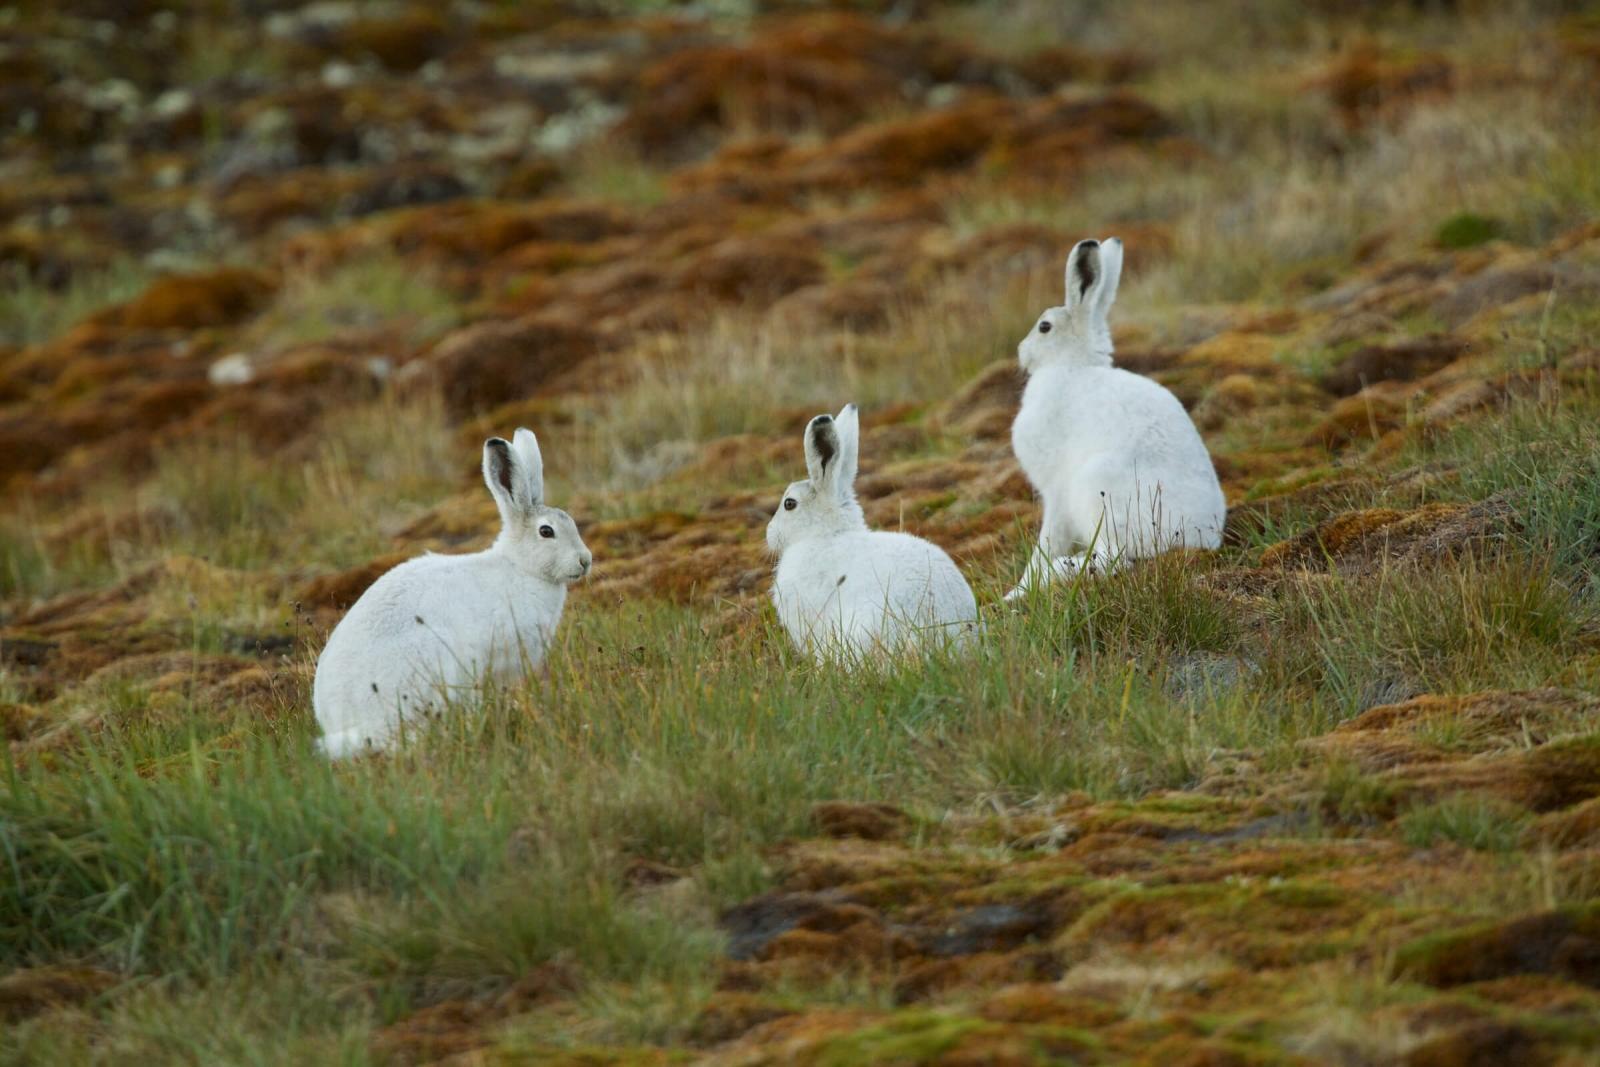 Three mountain hares in North Greenland. Photo by: Glenn Mattsing